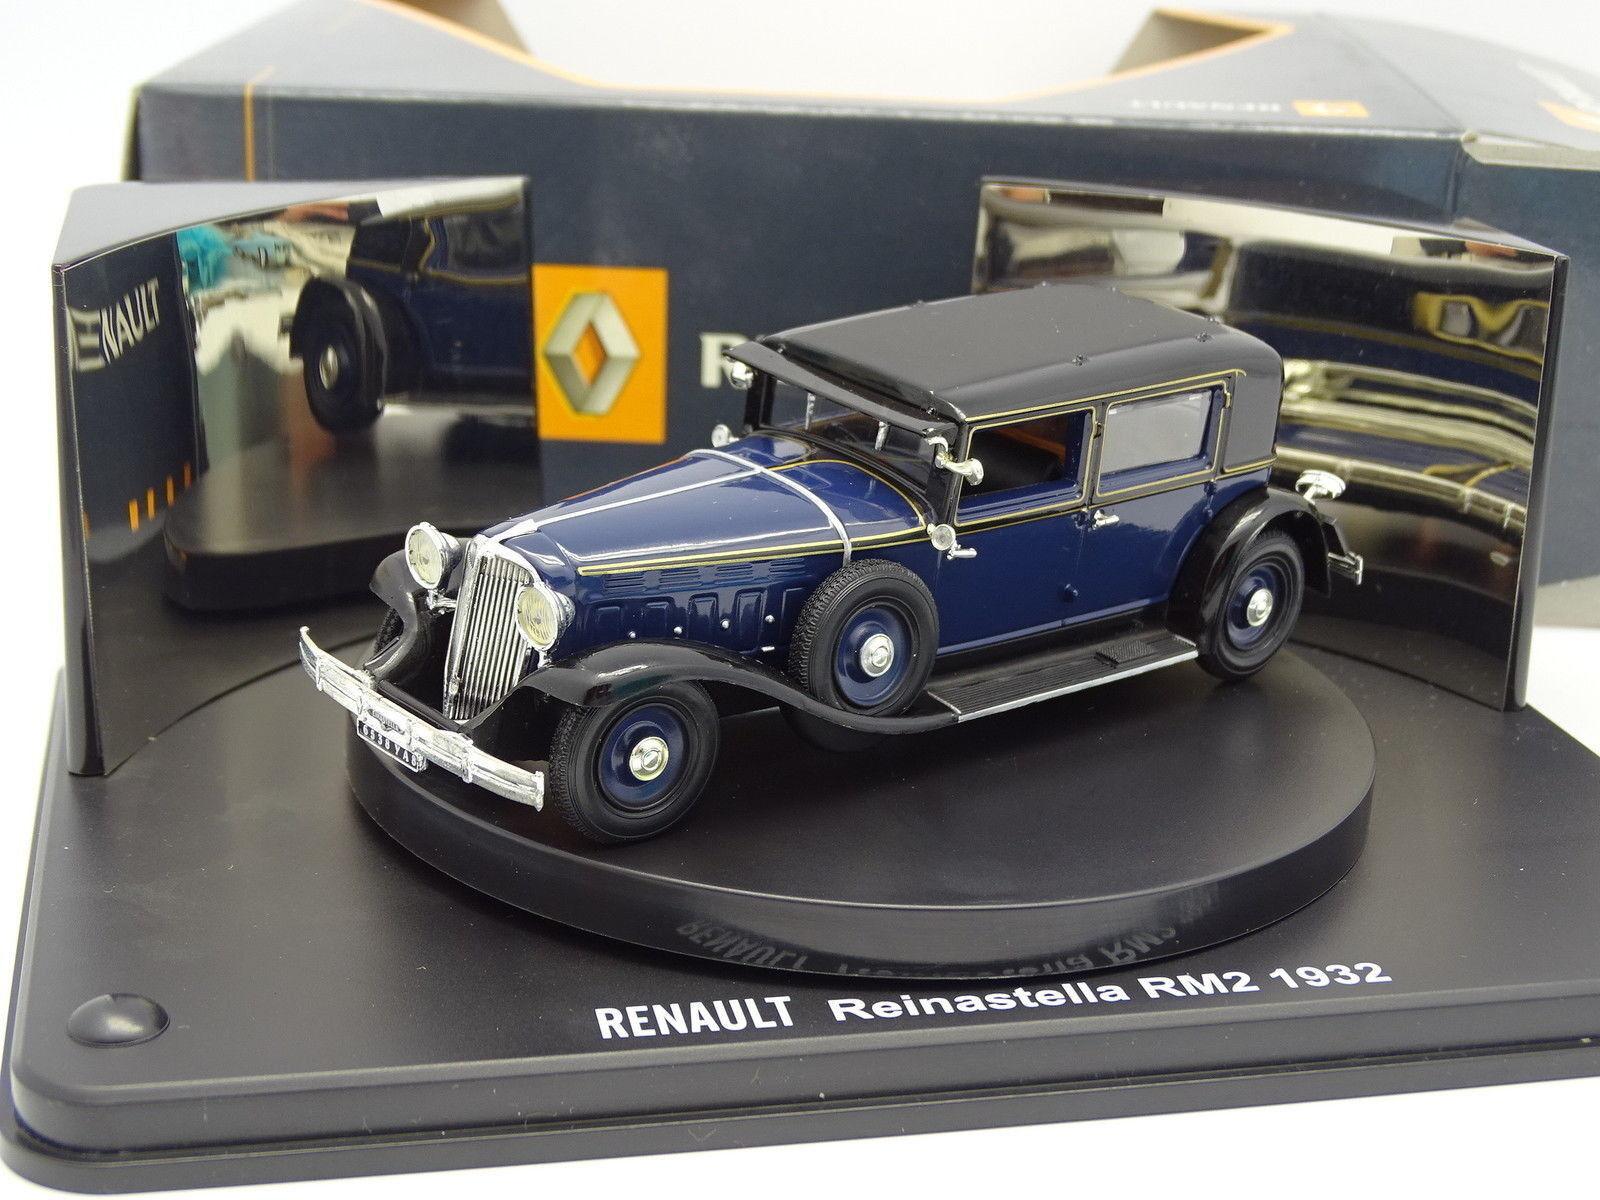 Norev 1 43 - Renault Reinastella RM2 1932 Bleue